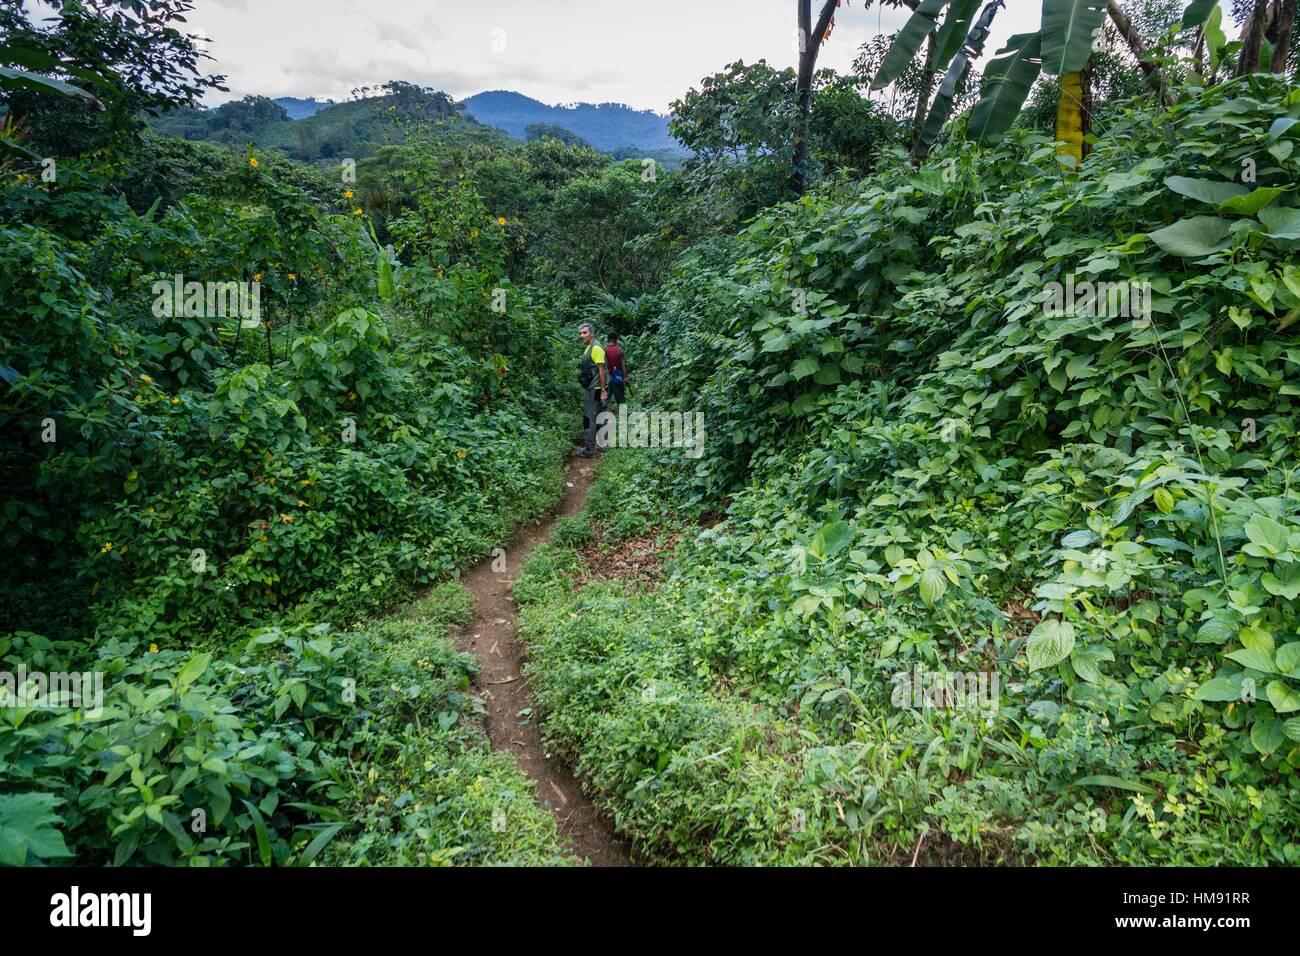 Escursion entre bosque tropical, Los Cerritos, Lancetillo, La parroquia, zona Reyna, Quiché, Guatemala, América Imagen De Stock